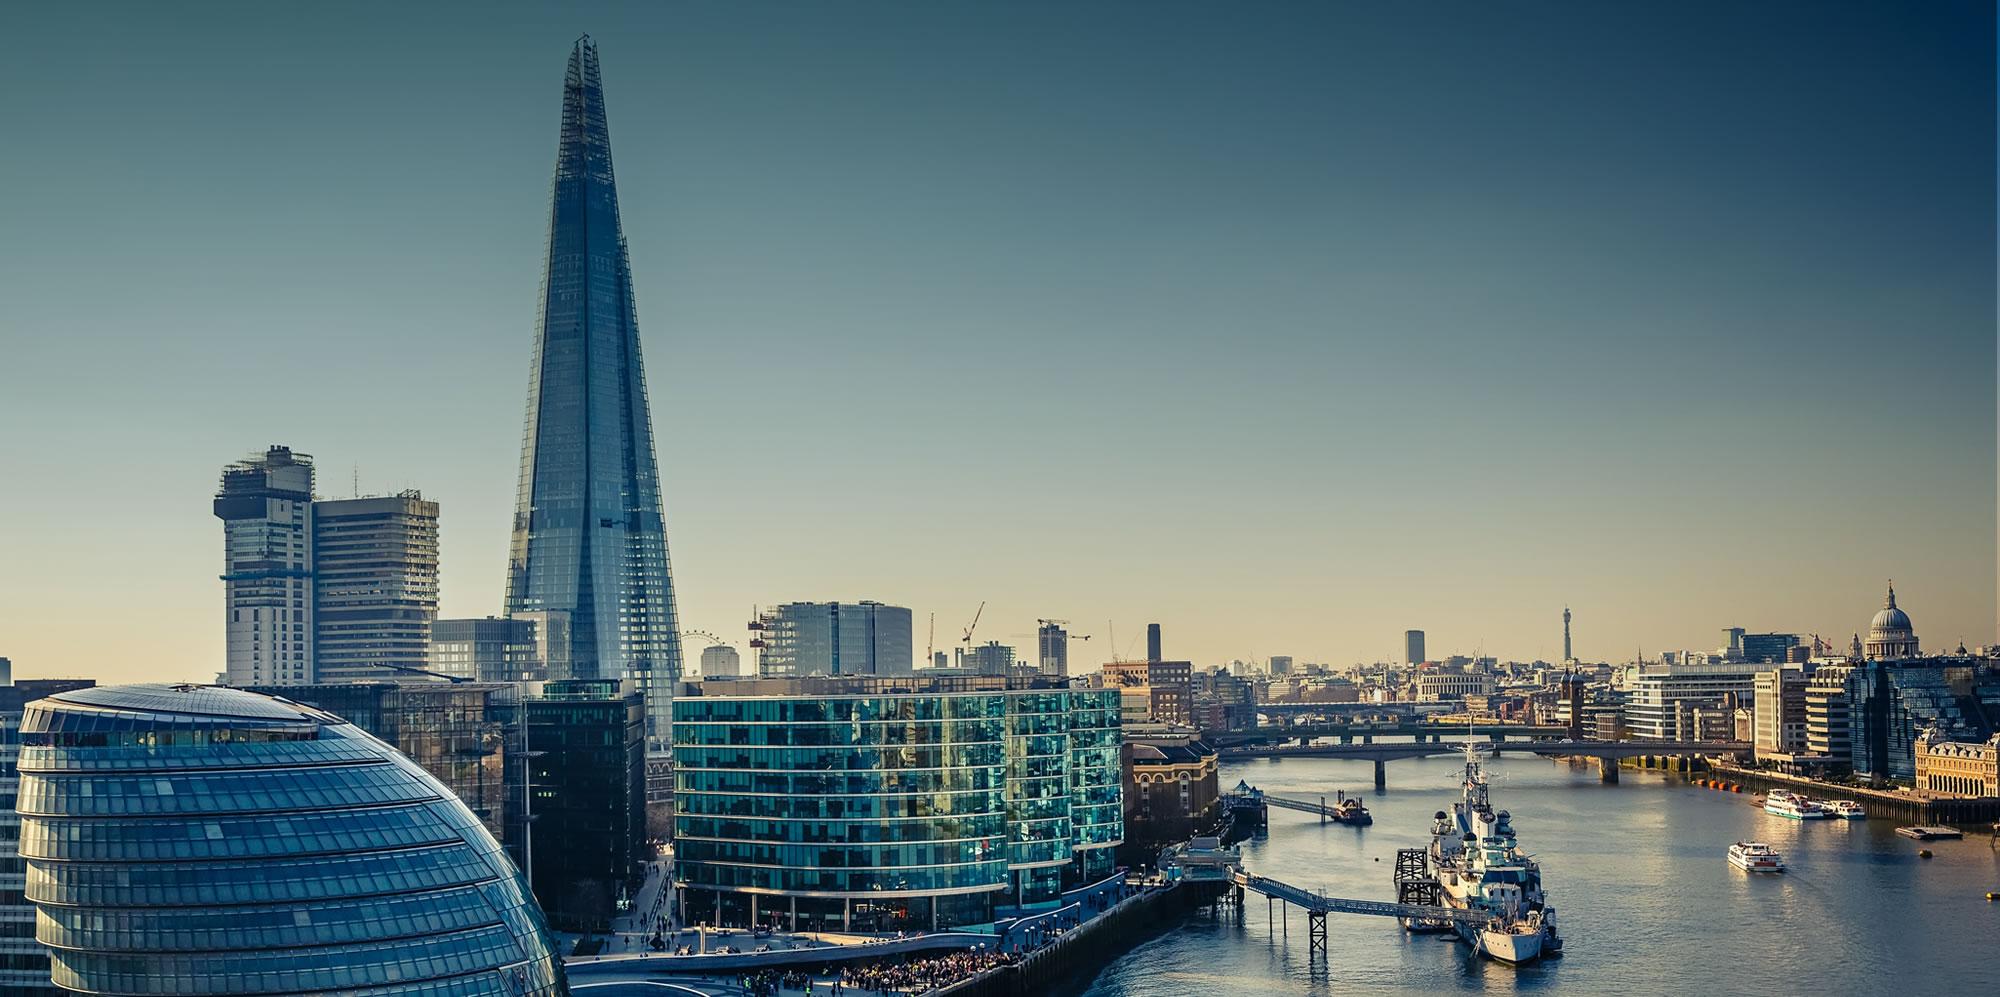 Londonbanner